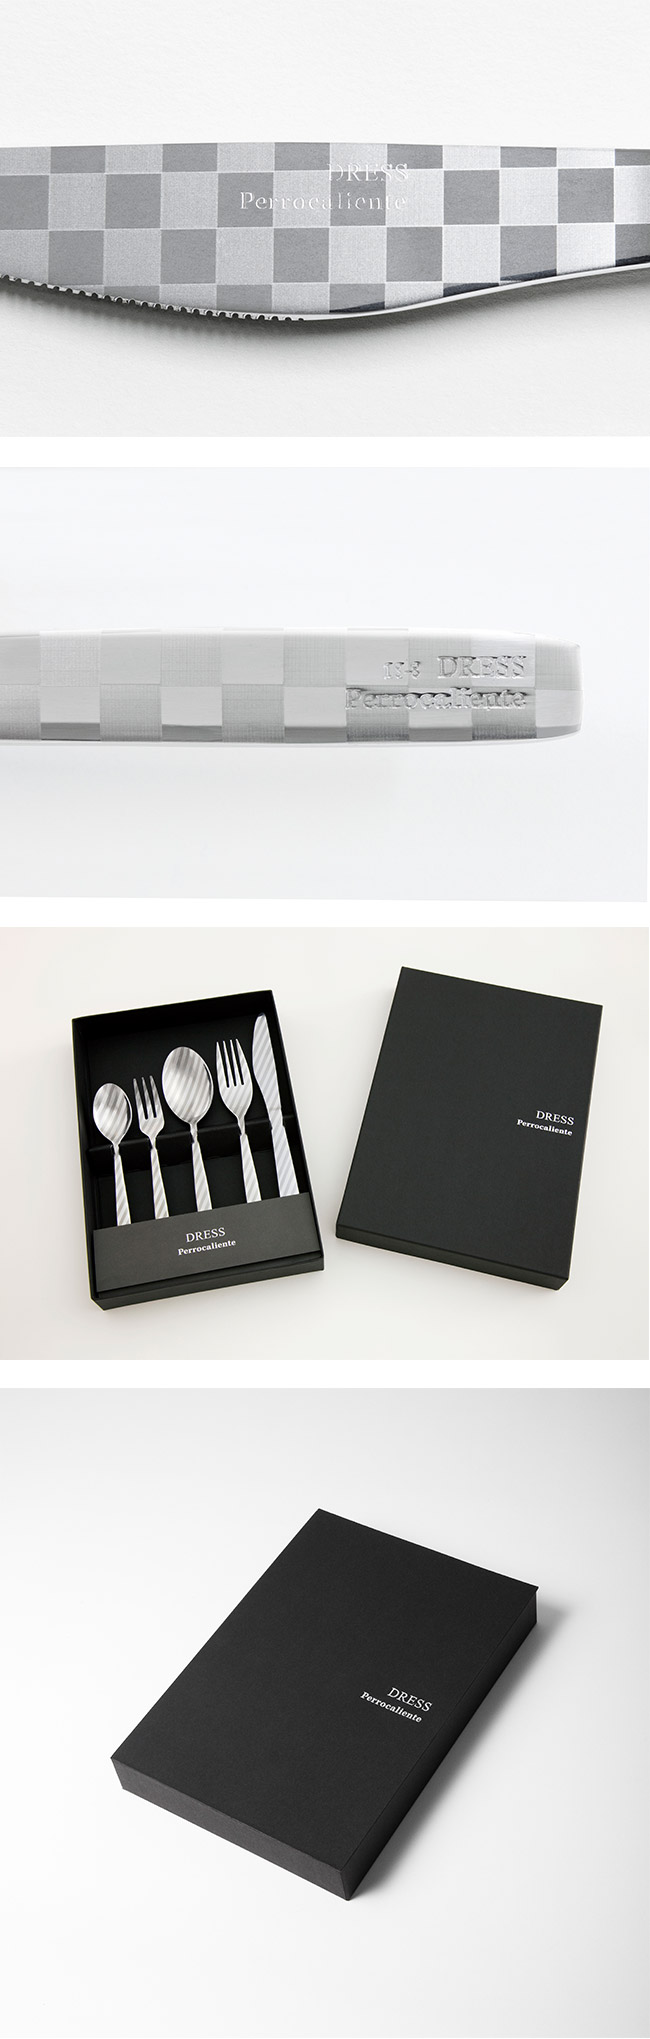 Perrocaliente Dress Gift Set 銀色盒裝餐具組 晚餐組 棋盤格 (湯匙+叉子+餐刀)